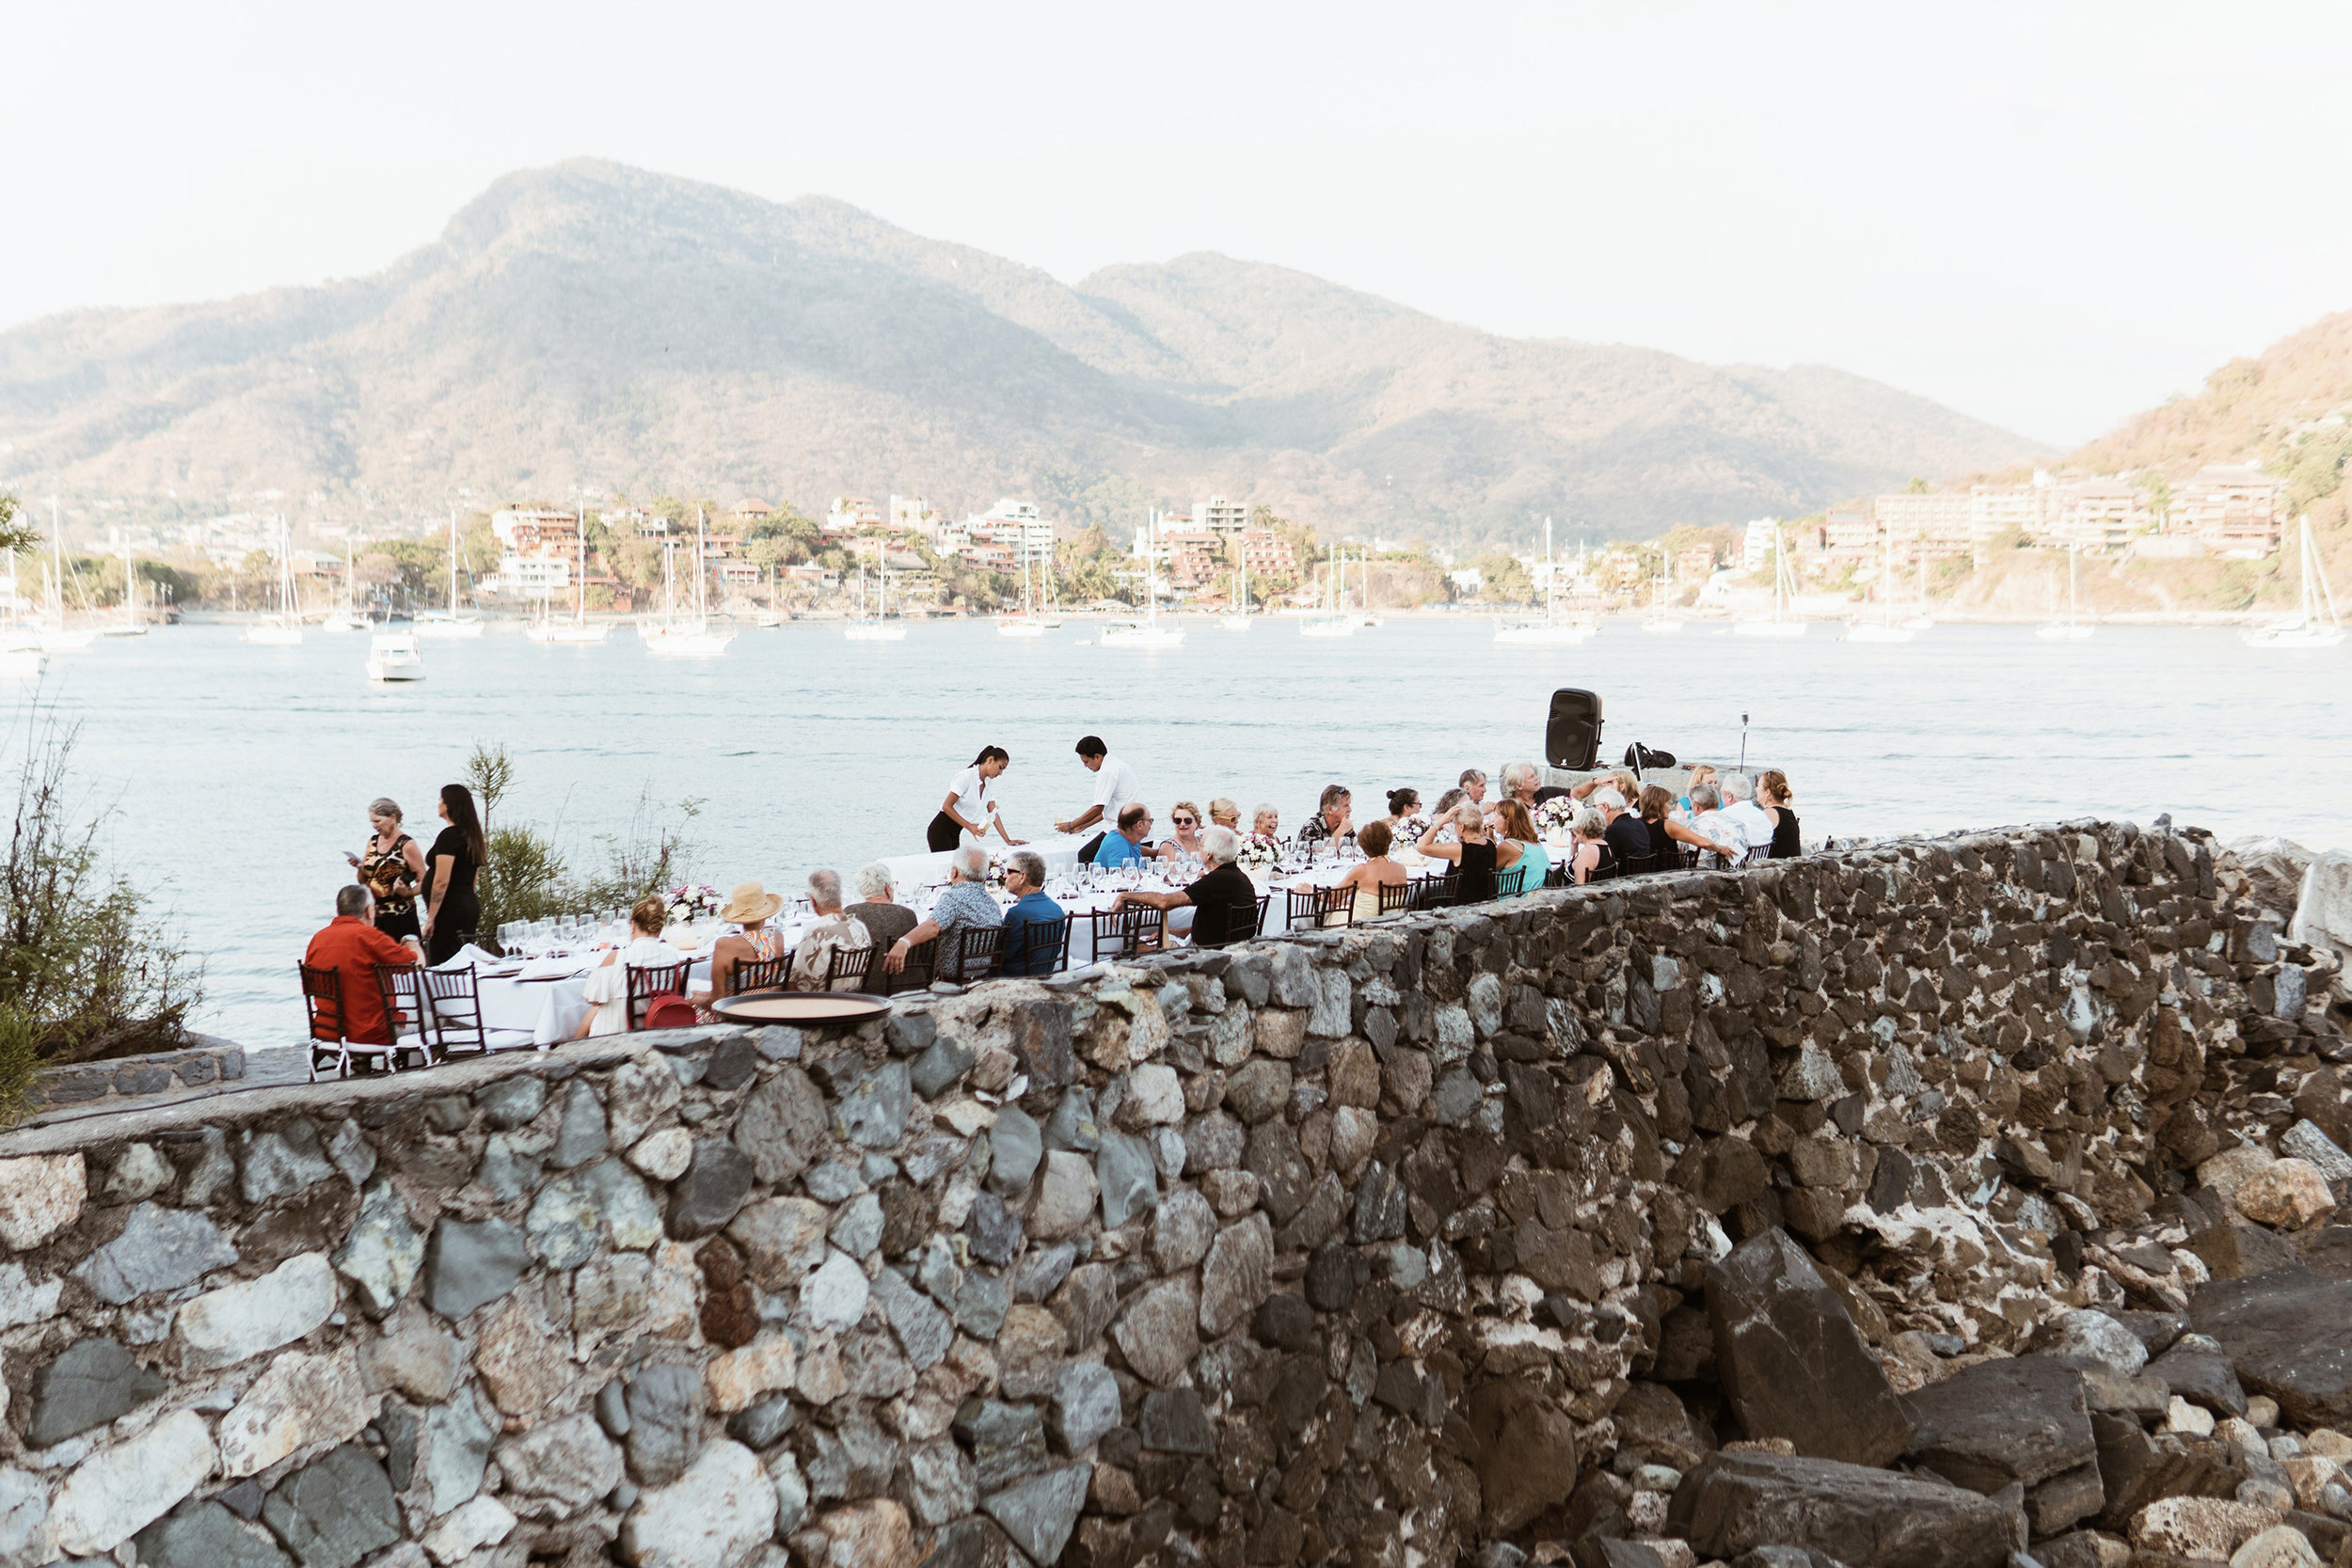 Clandestina-Zihuatanejo-Angustina-Chef-Felipe-Fotografia-Heiko-Bothe-7.jpg